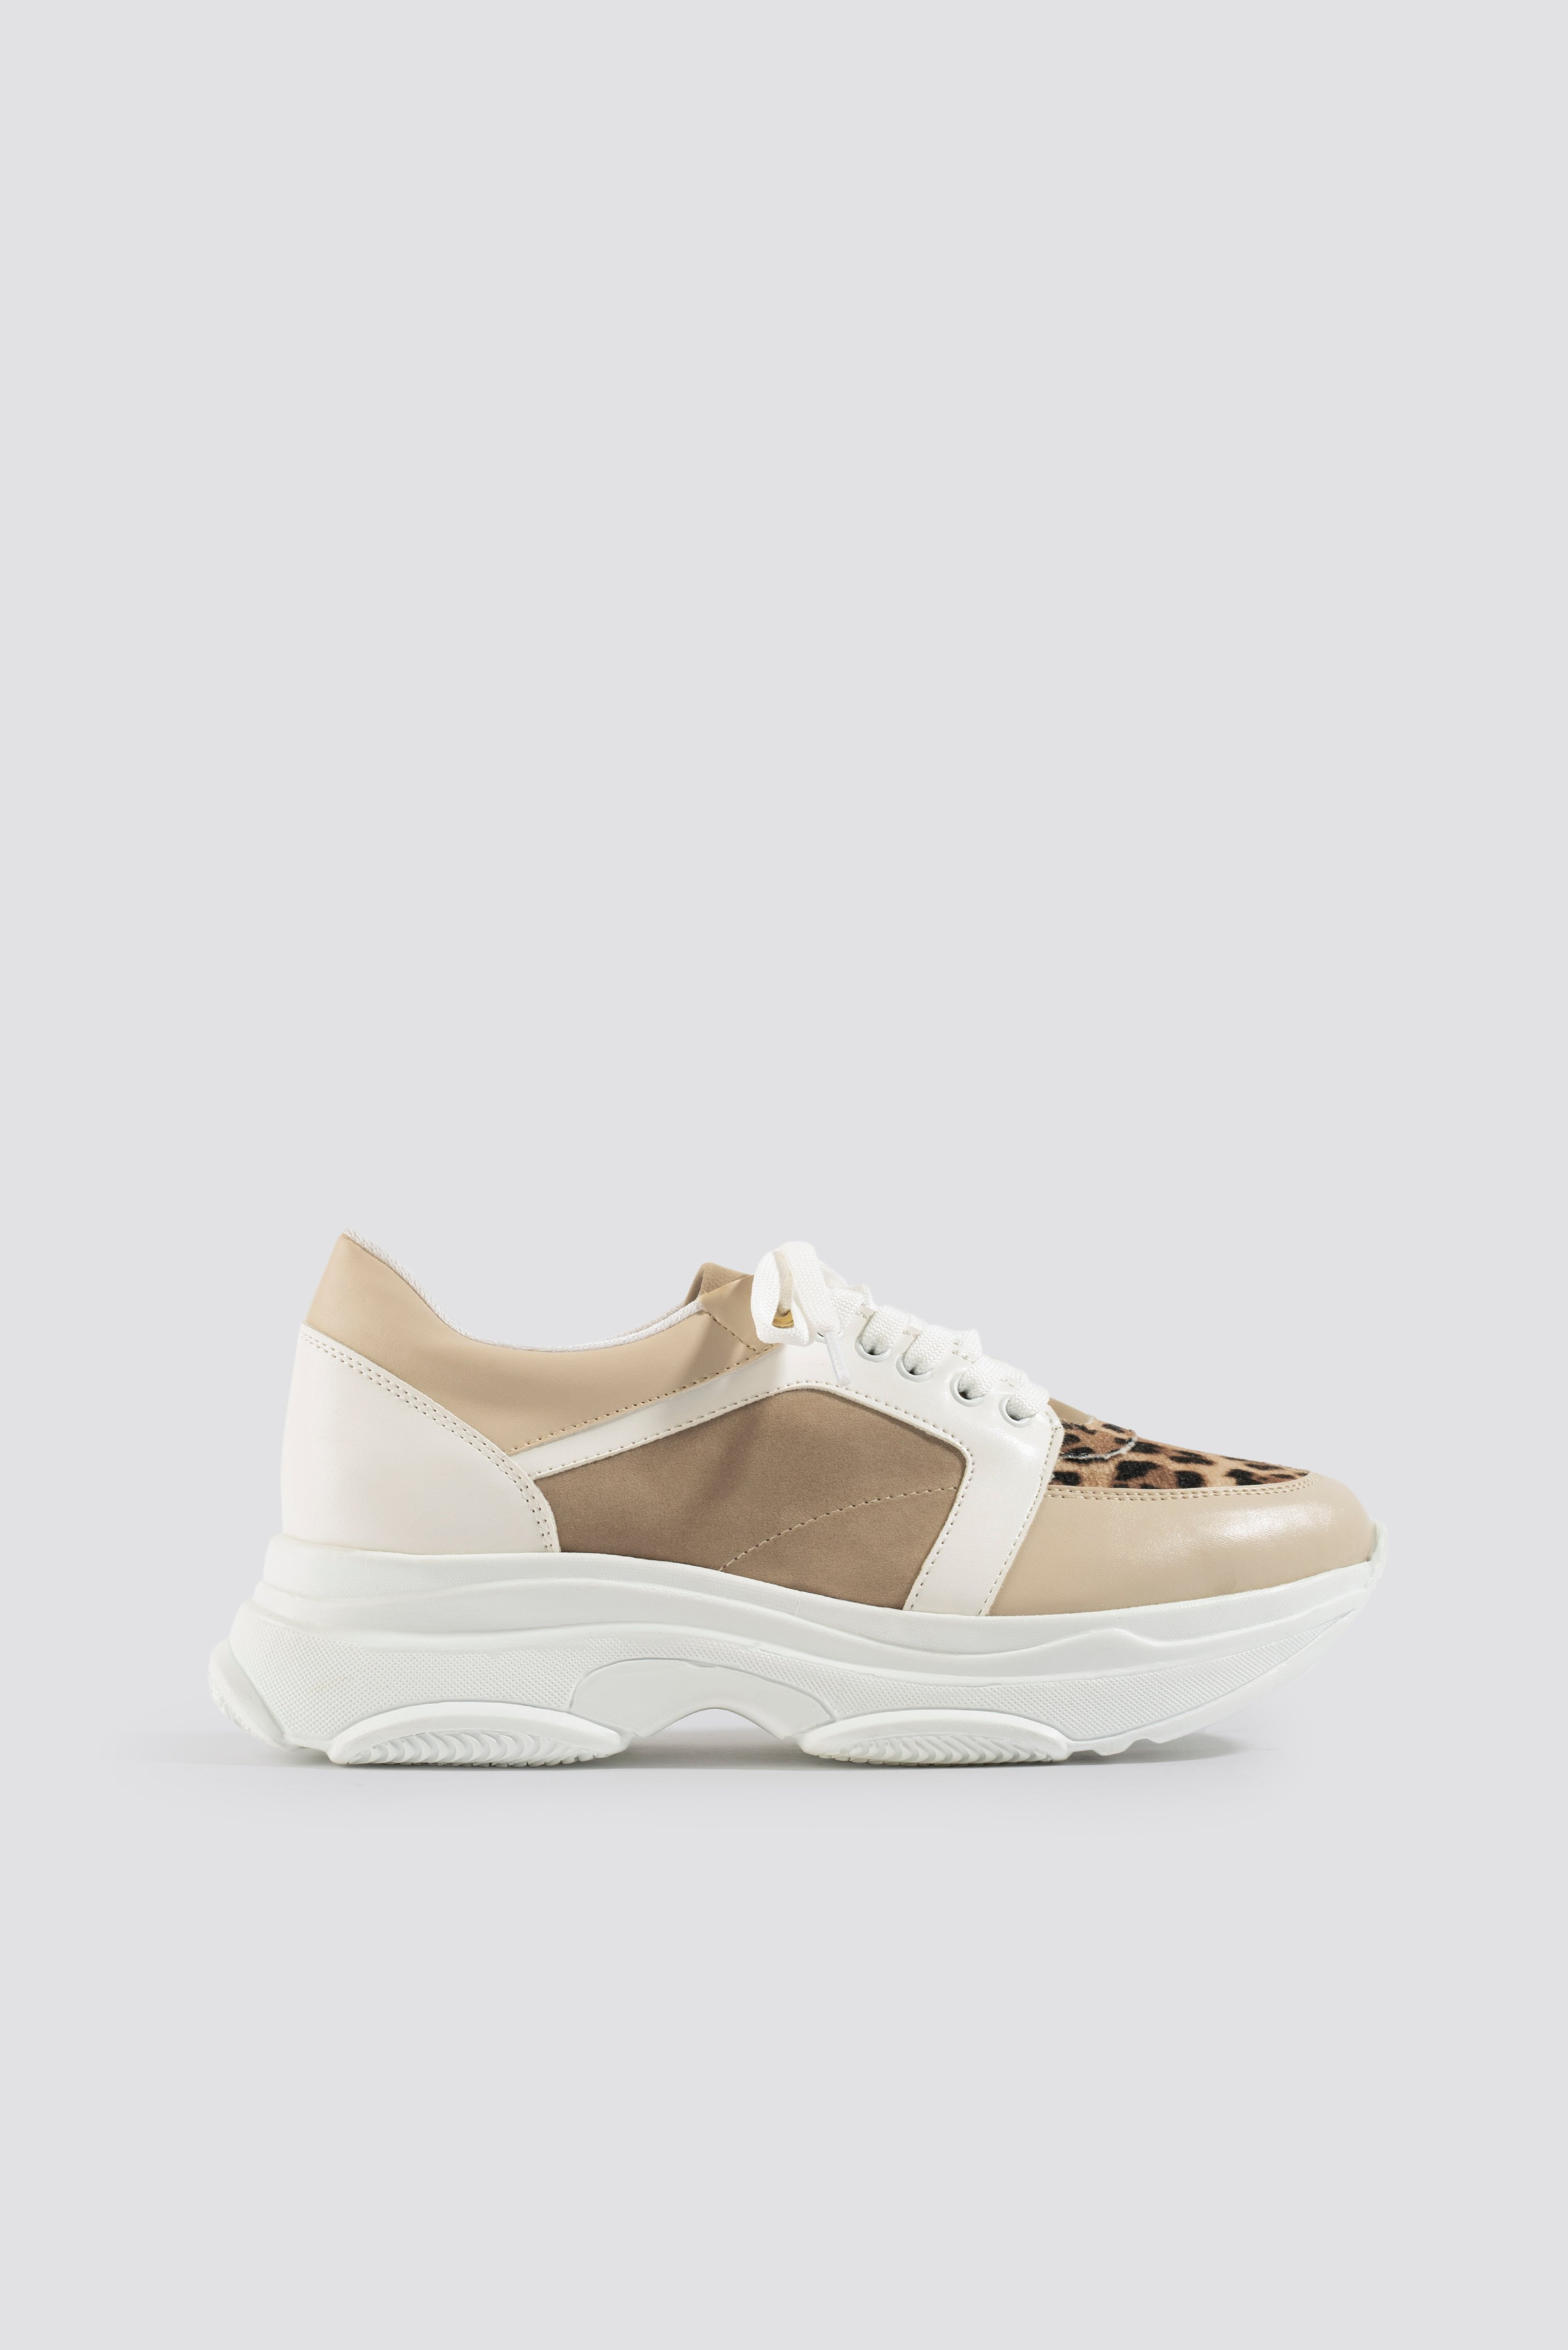 trendyol -  Yol Leo Sneakers - Beige